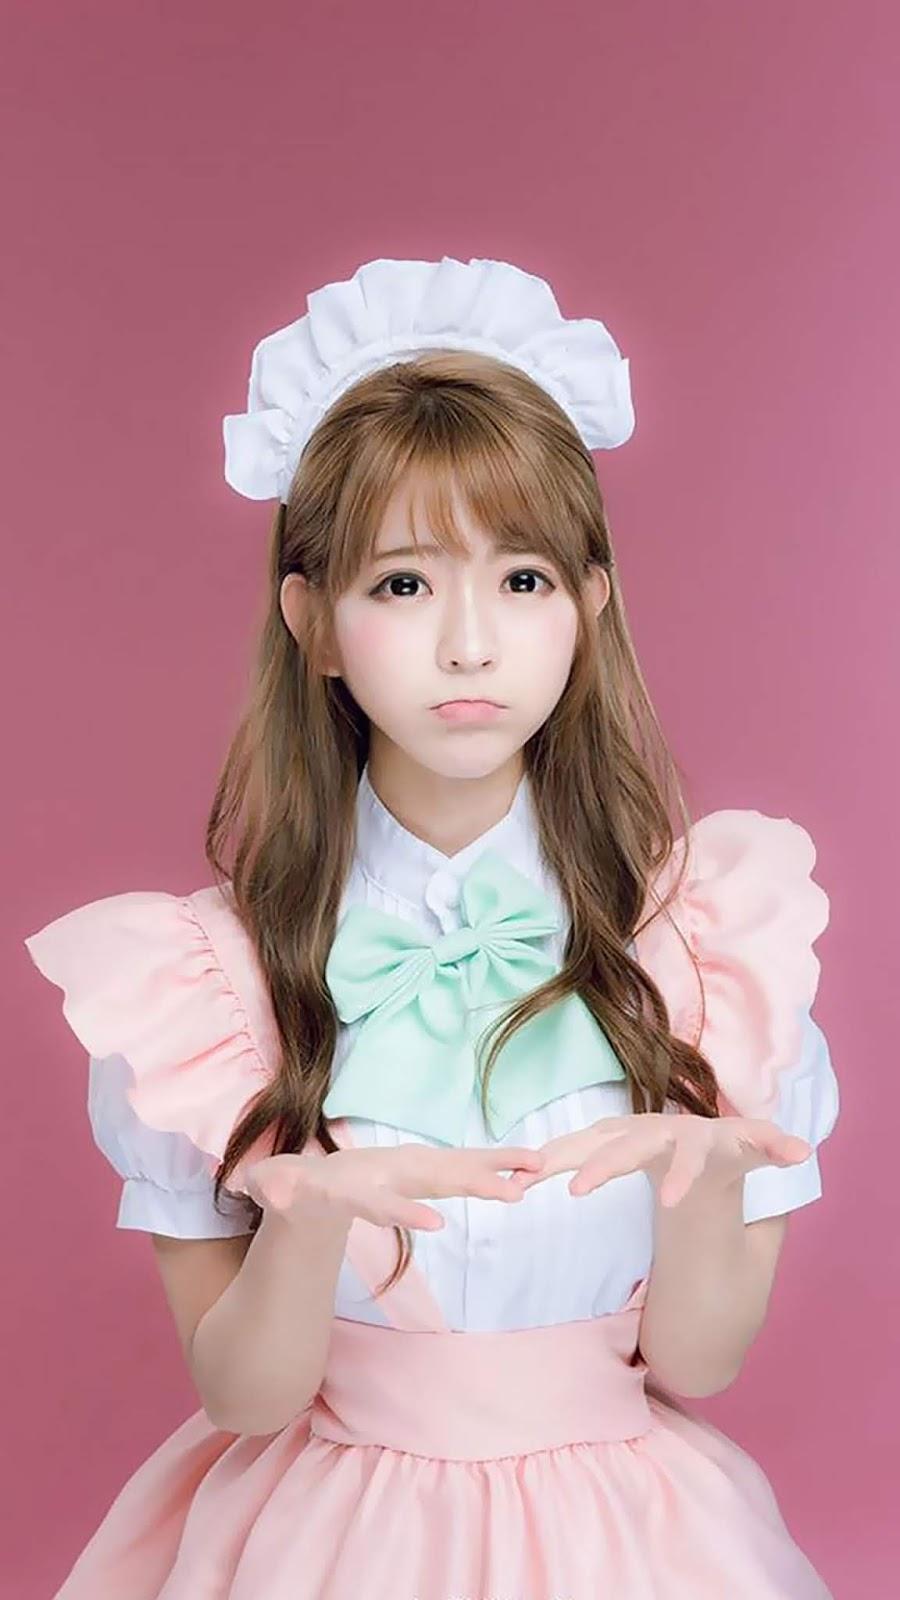 Cute maid Mobile Wallpaper